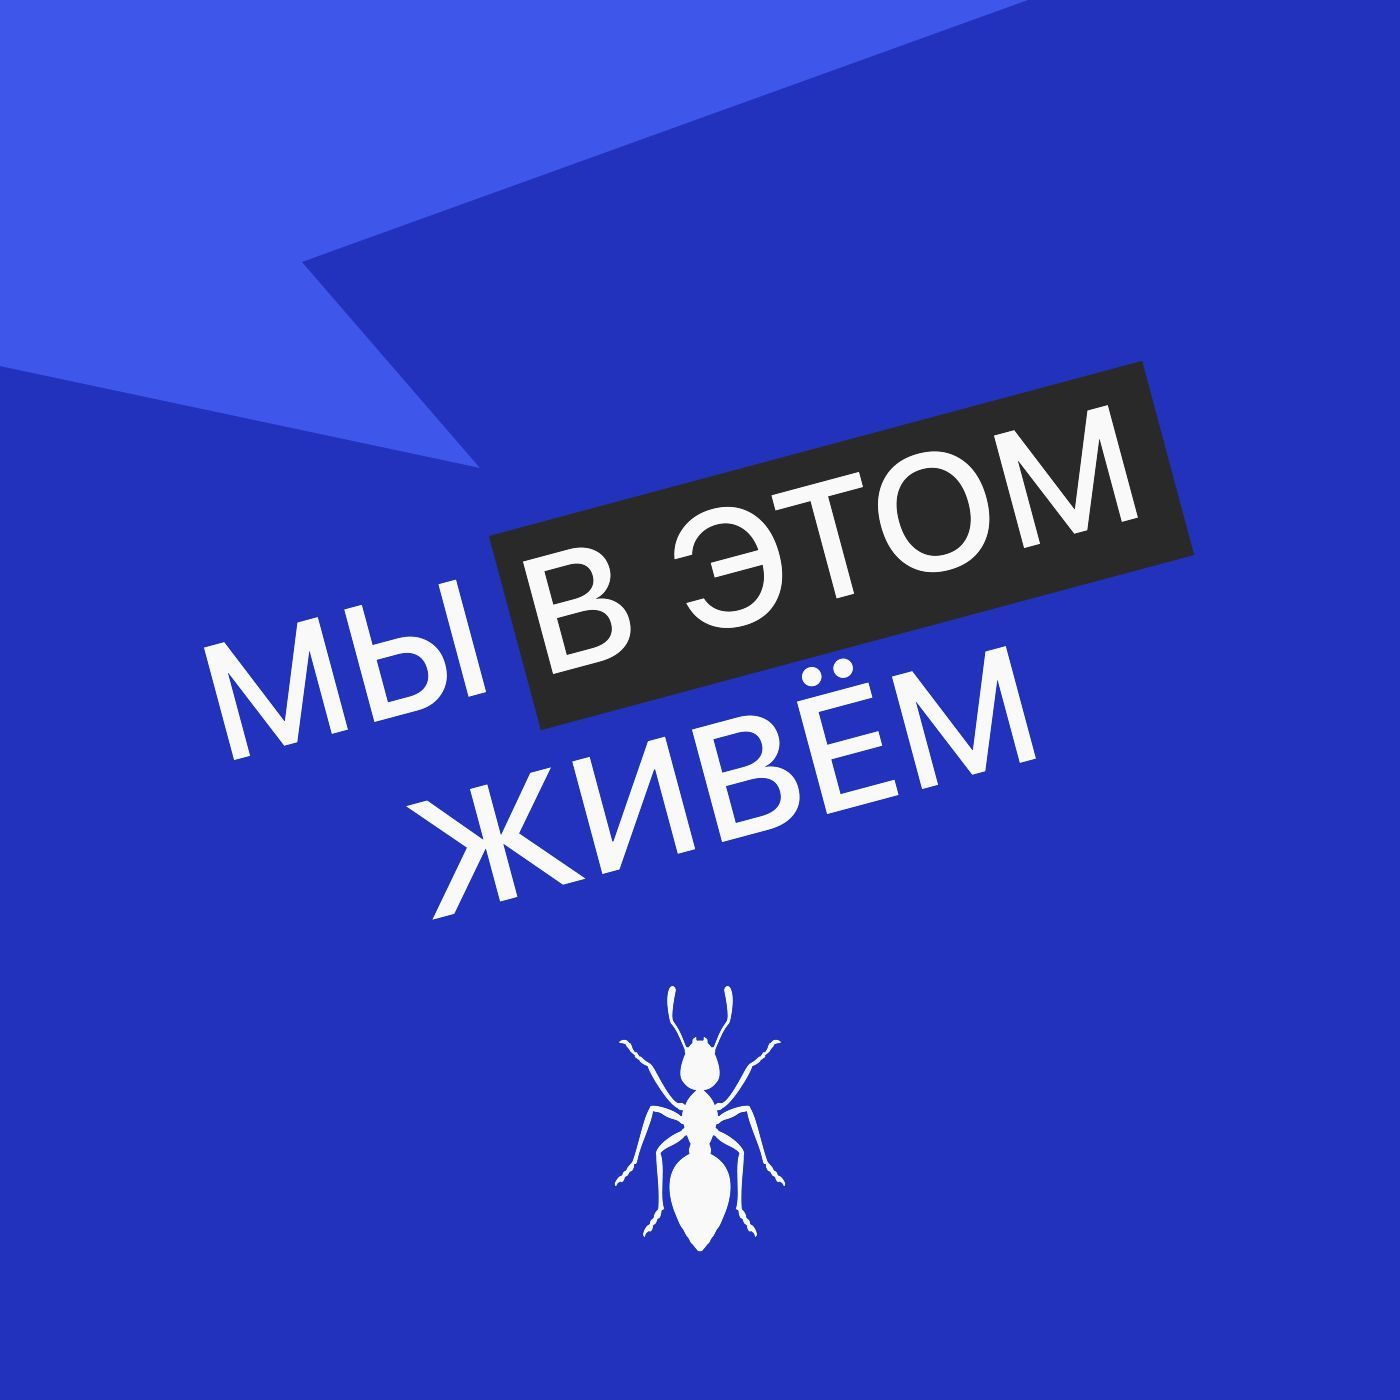 Творческий коллектив Mojomedia Выпуск № 25 сезон 2 СтройКотМаразм